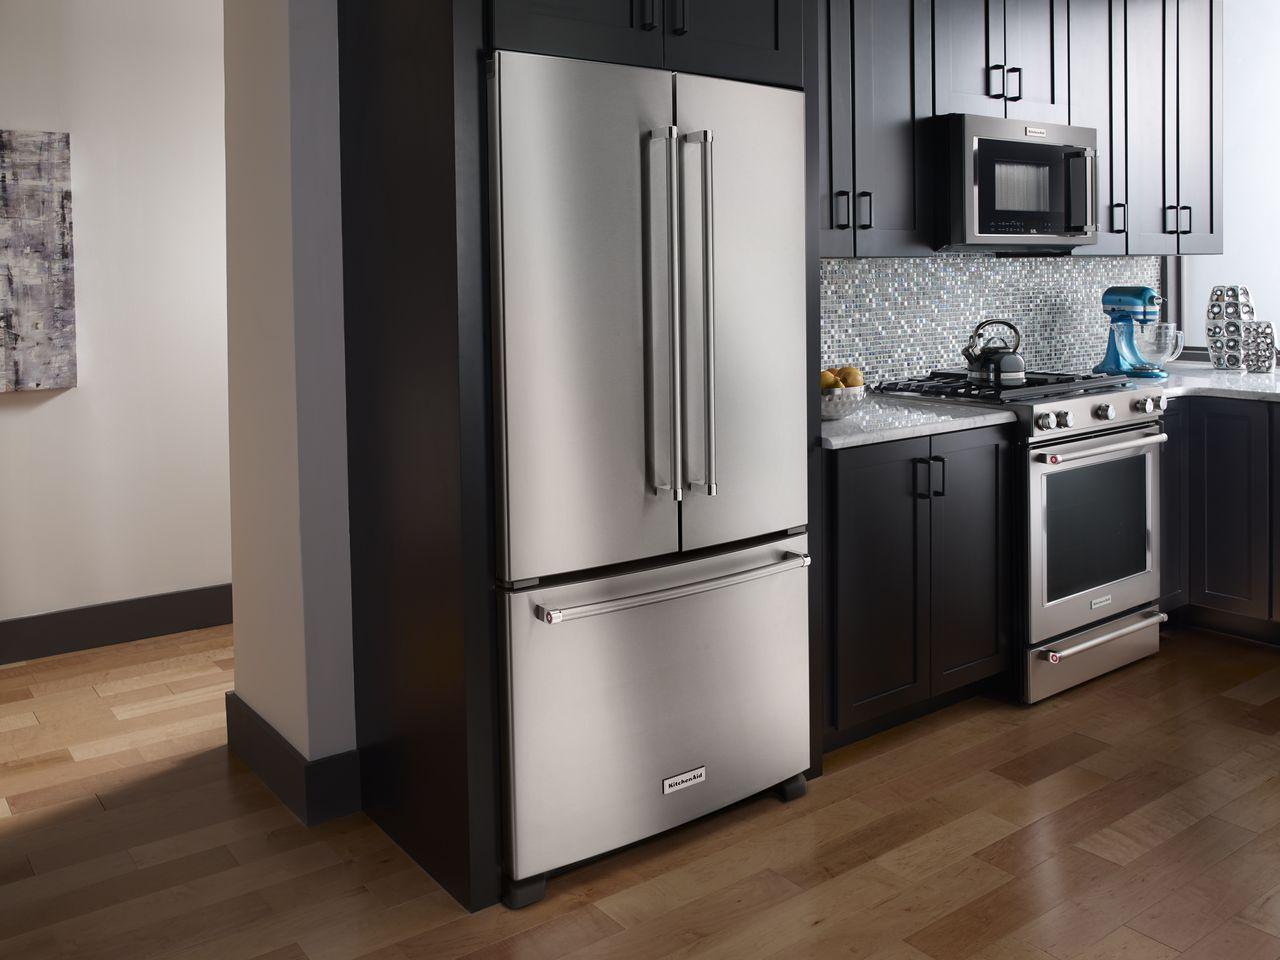 Counter Depth Refrigerator Only Kitchenaid Stainless French Door Refrigerator Krfc302ess